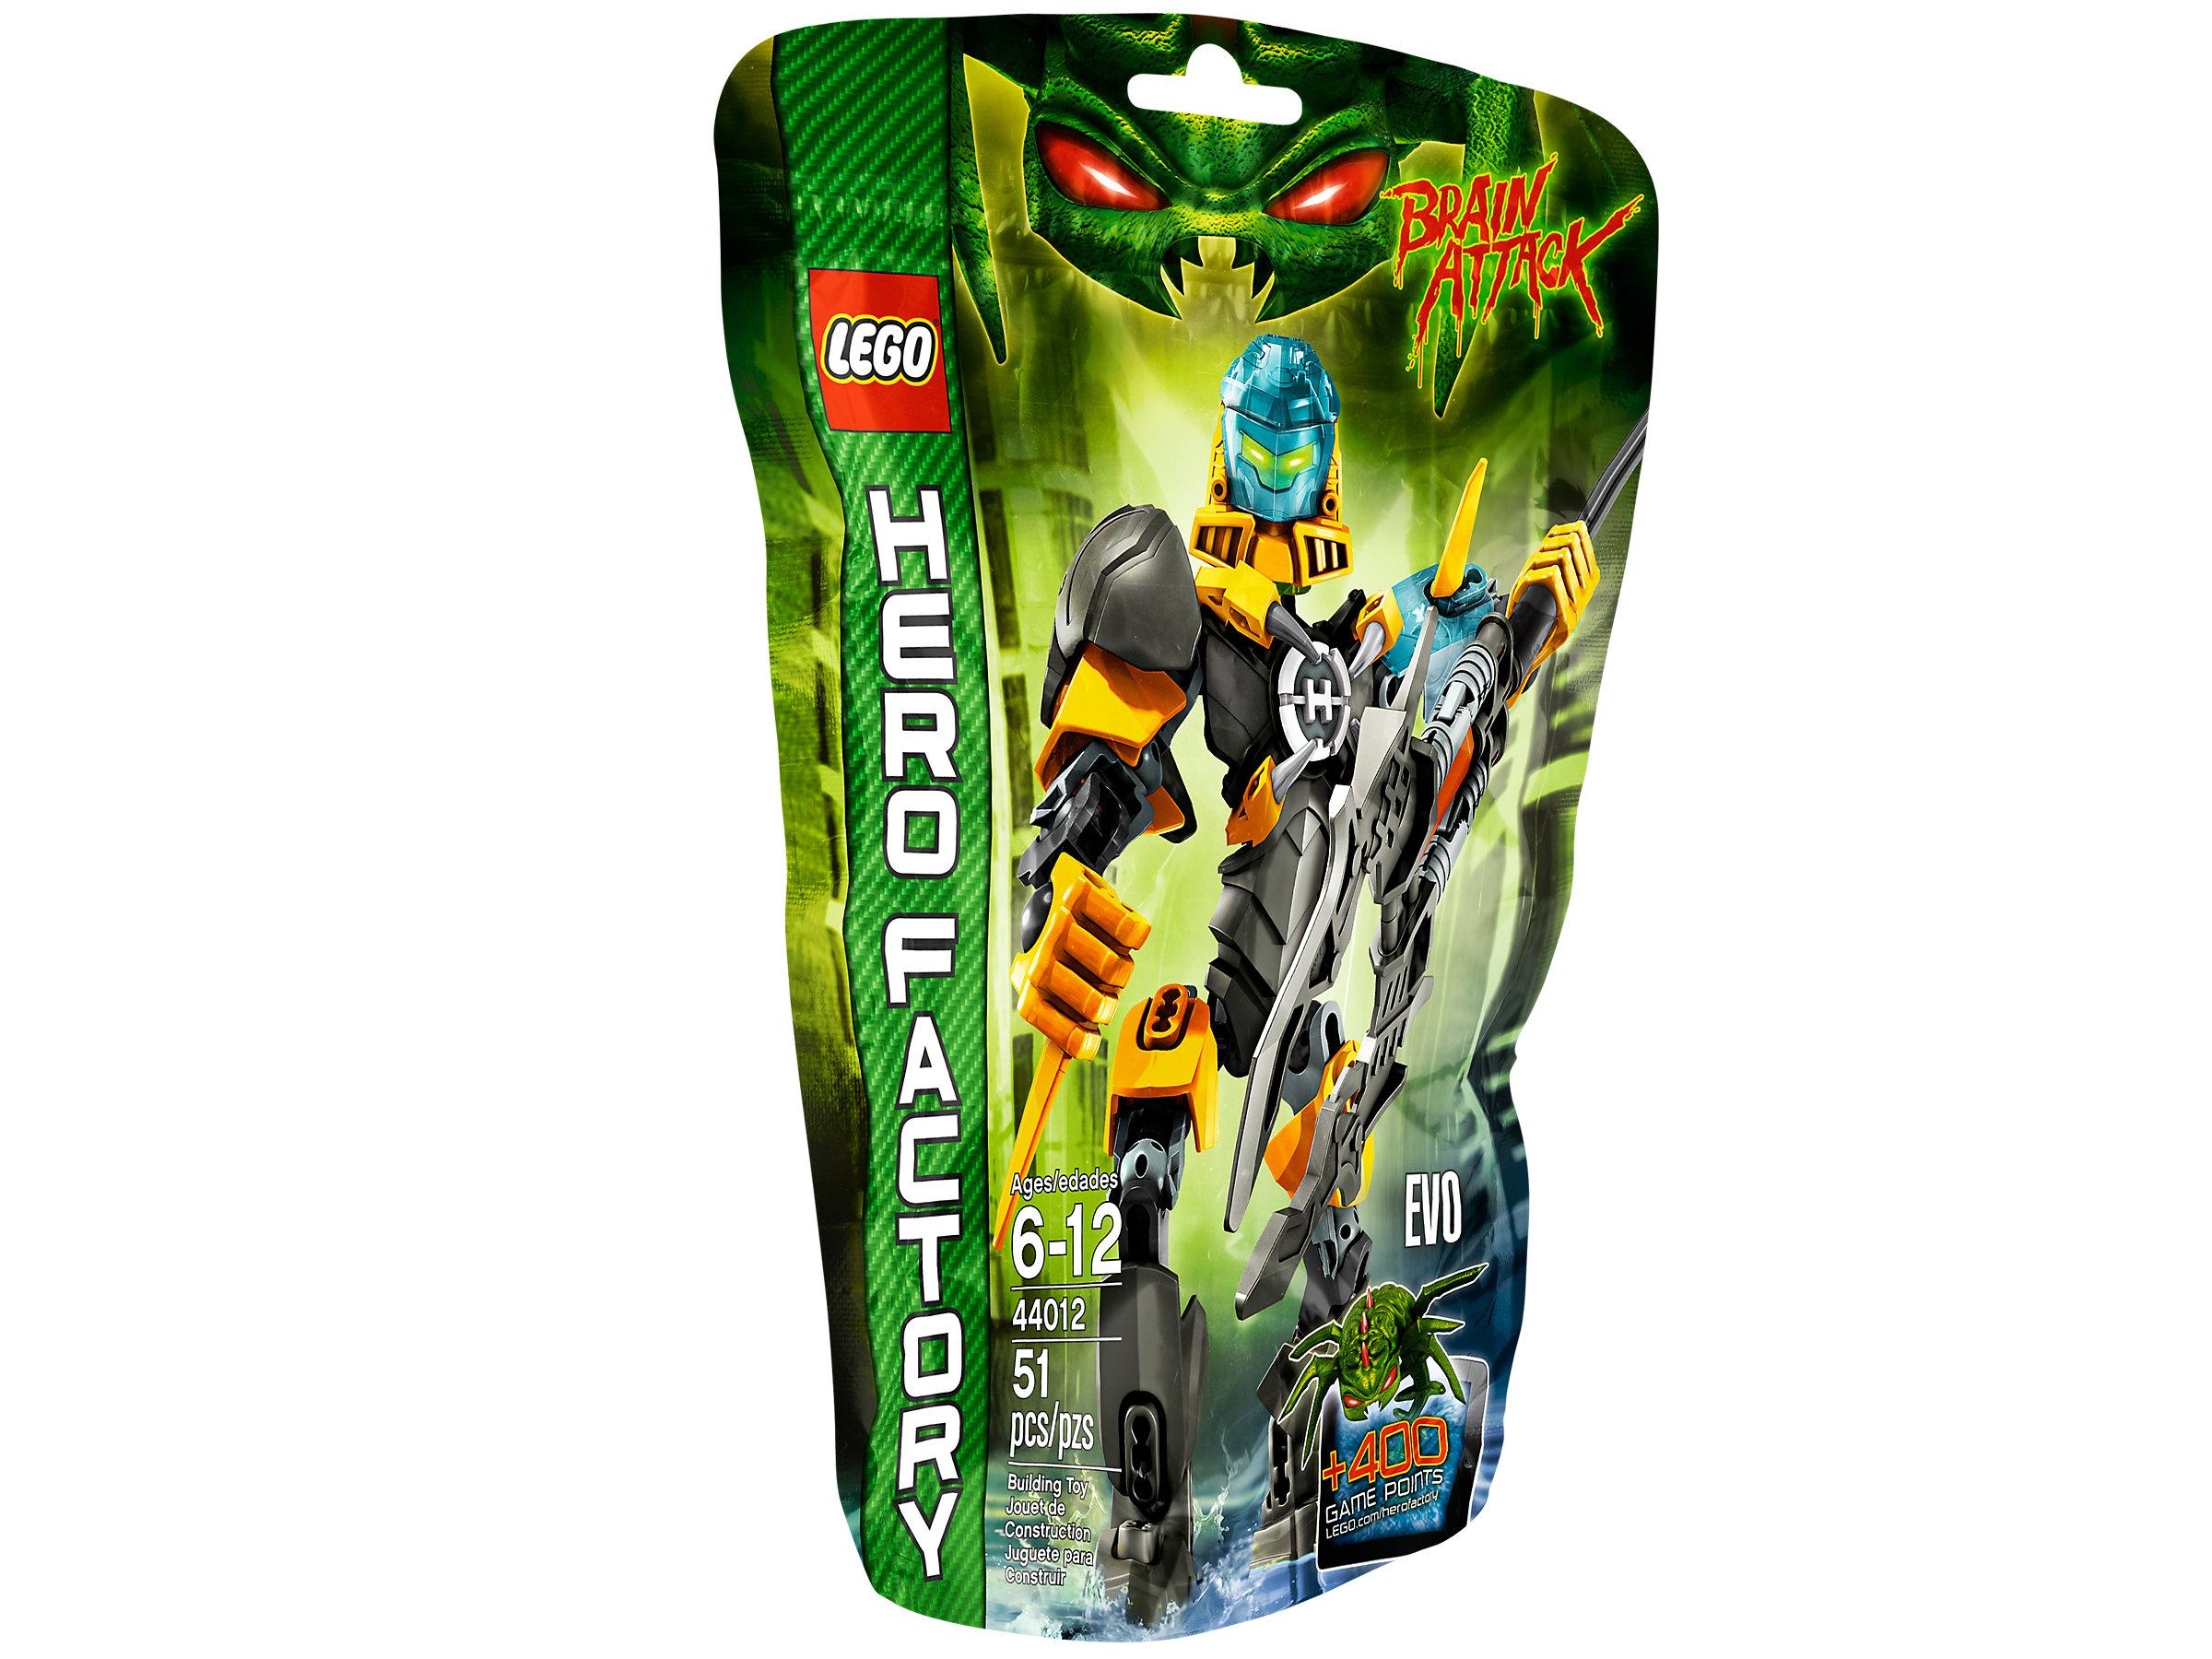 Lego Hero Factory Brain Attack 44012 EVO NEW FACTORY SEALED Retired